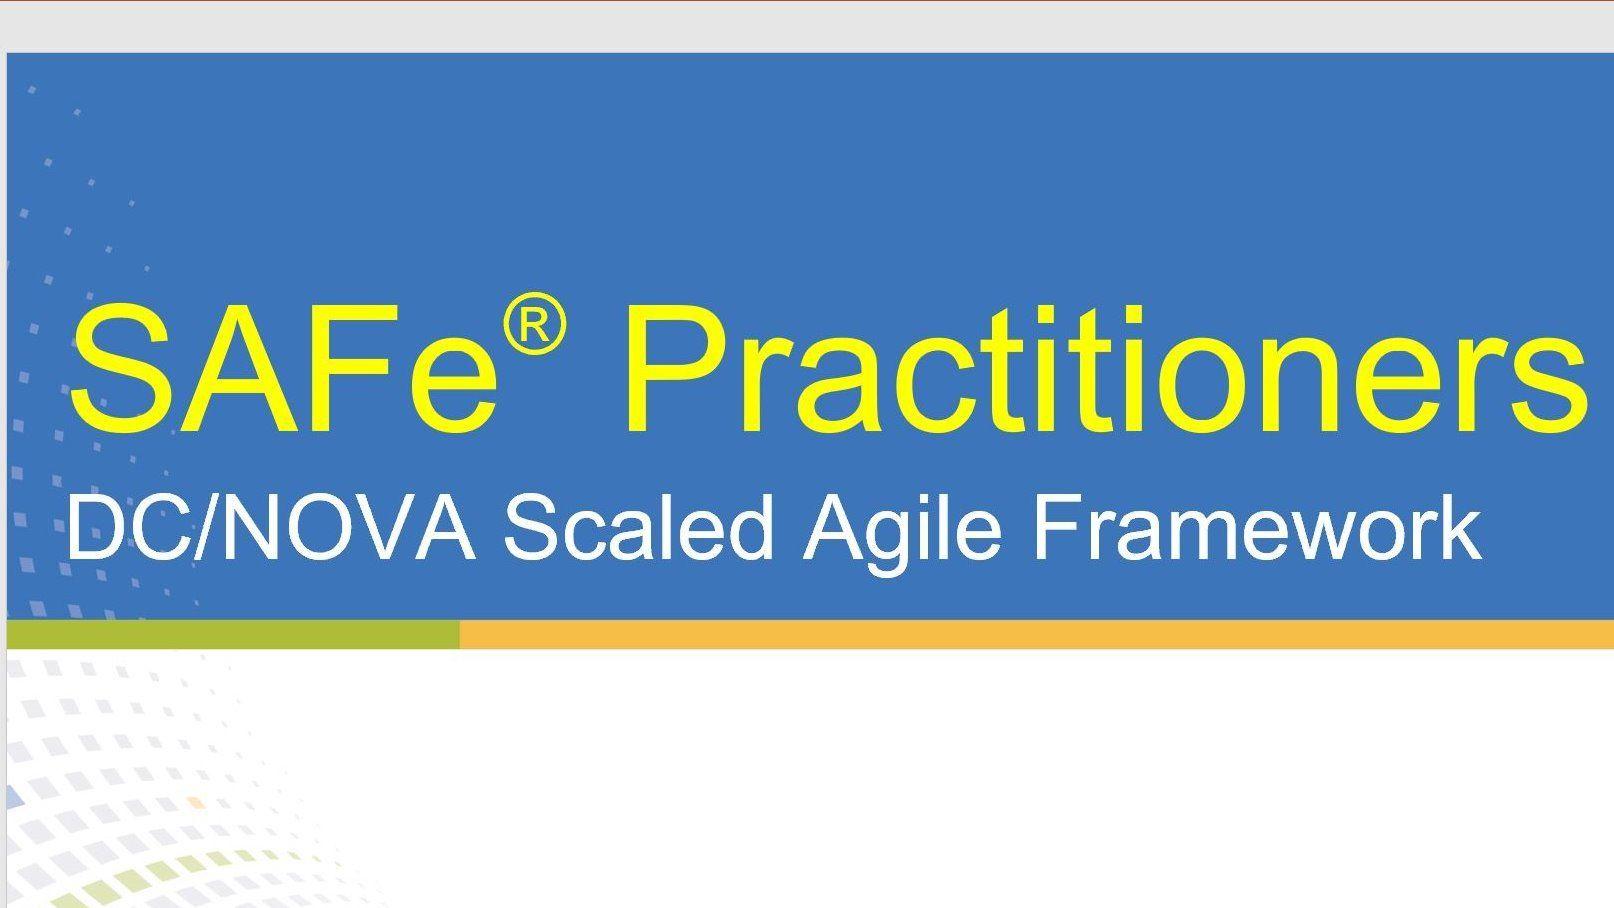 DC/NOVA Scaled Agile (SAFe) Practitioners